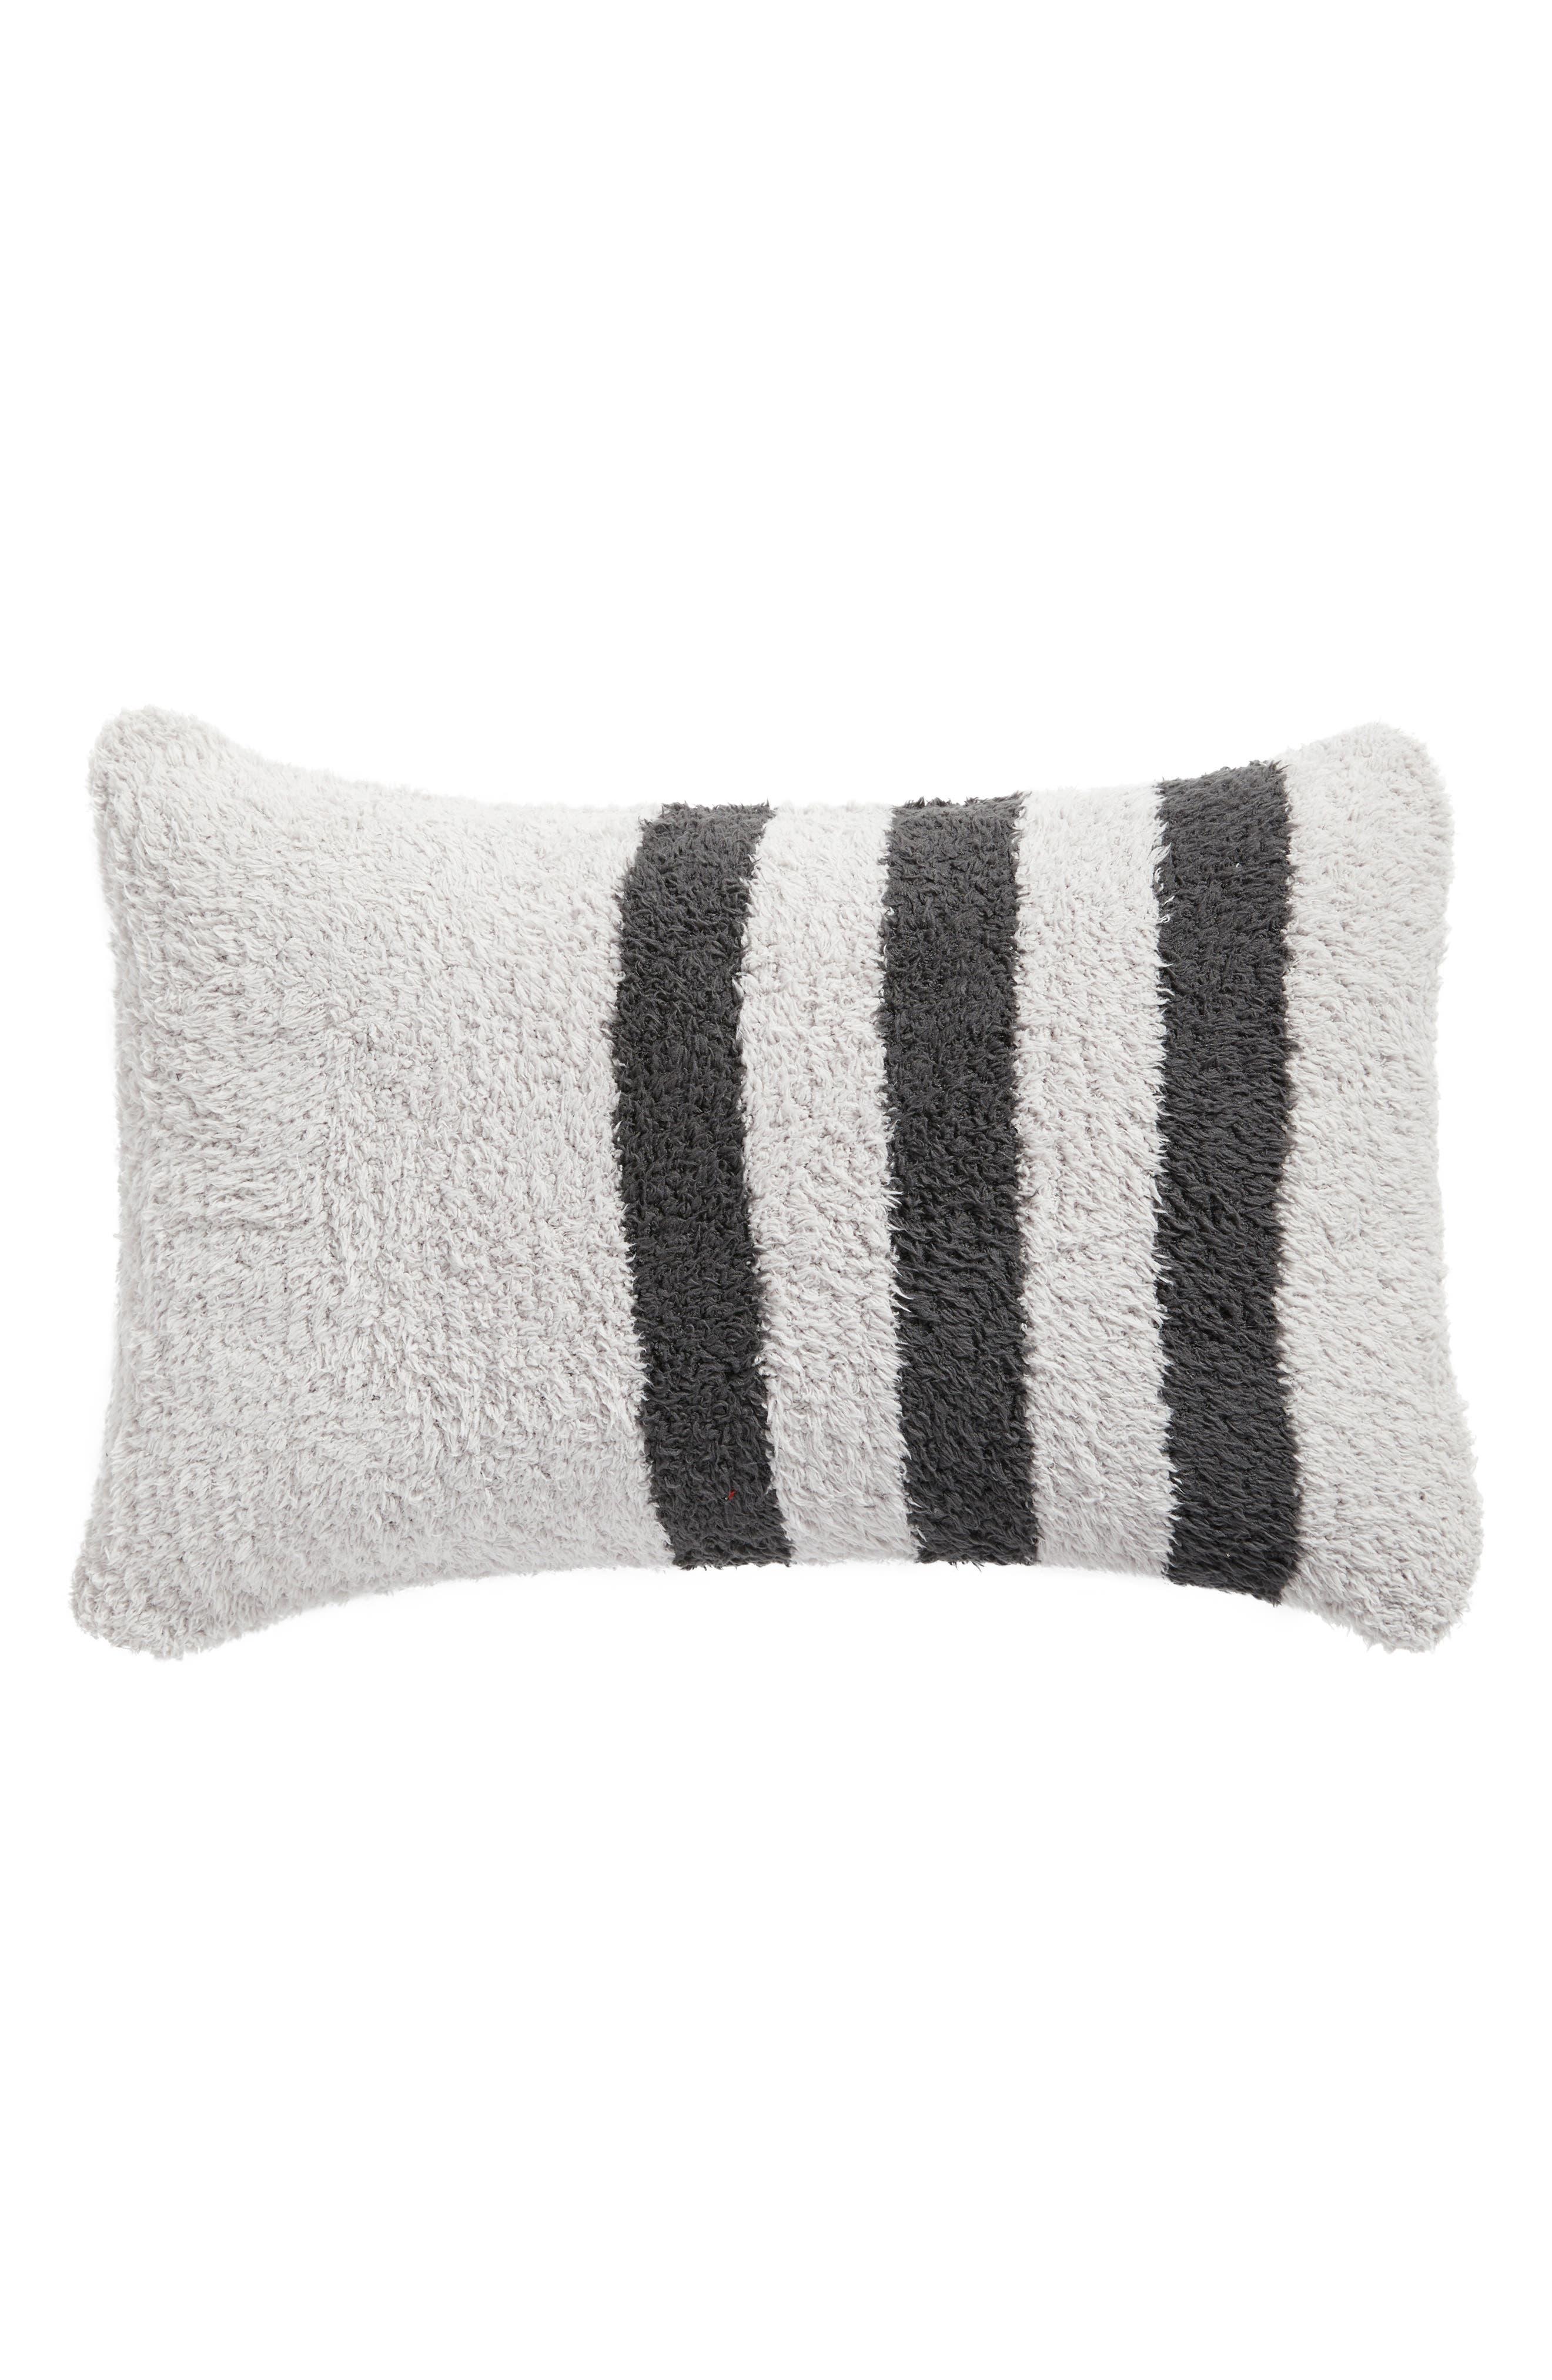 Cozychic<sup>®</sup> Tri-Stripe Accent Pillow,                             Main thumbnail 1, color,                             056